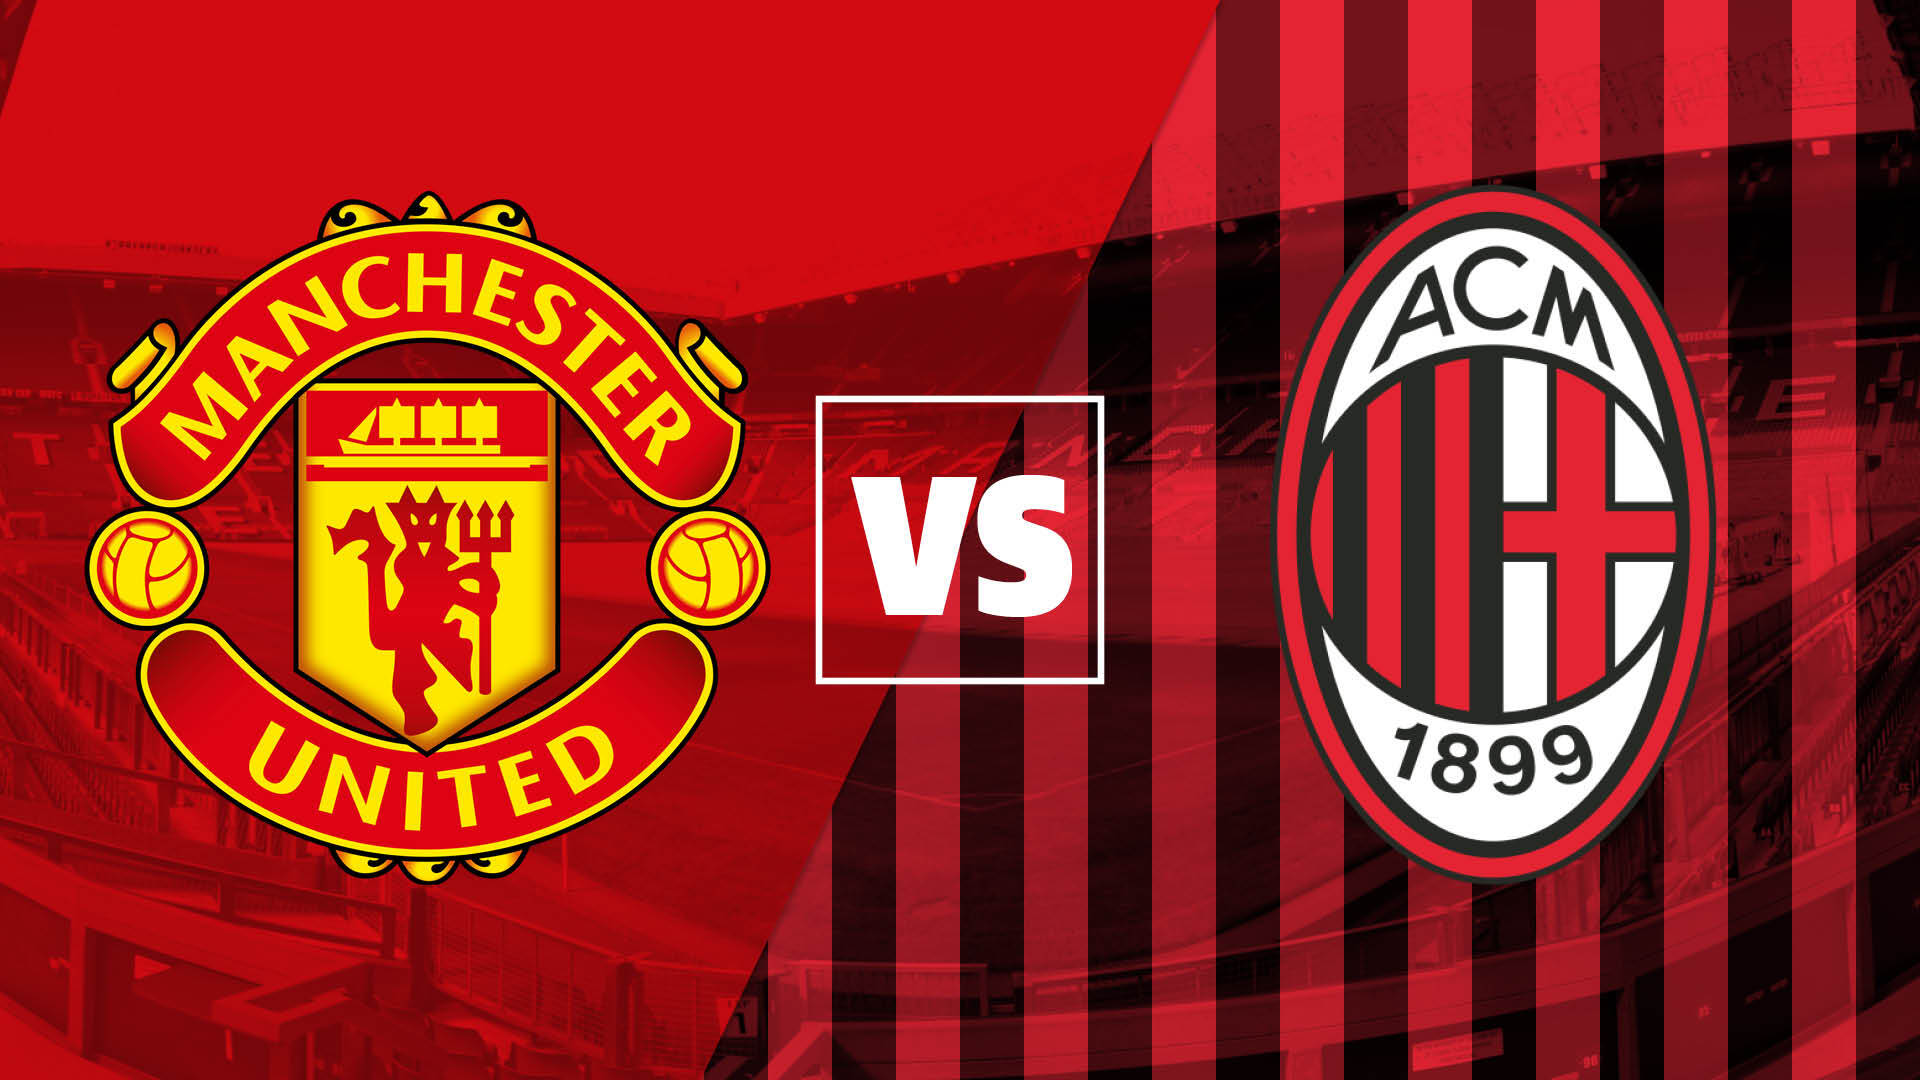 AC Milan vs Manchester United